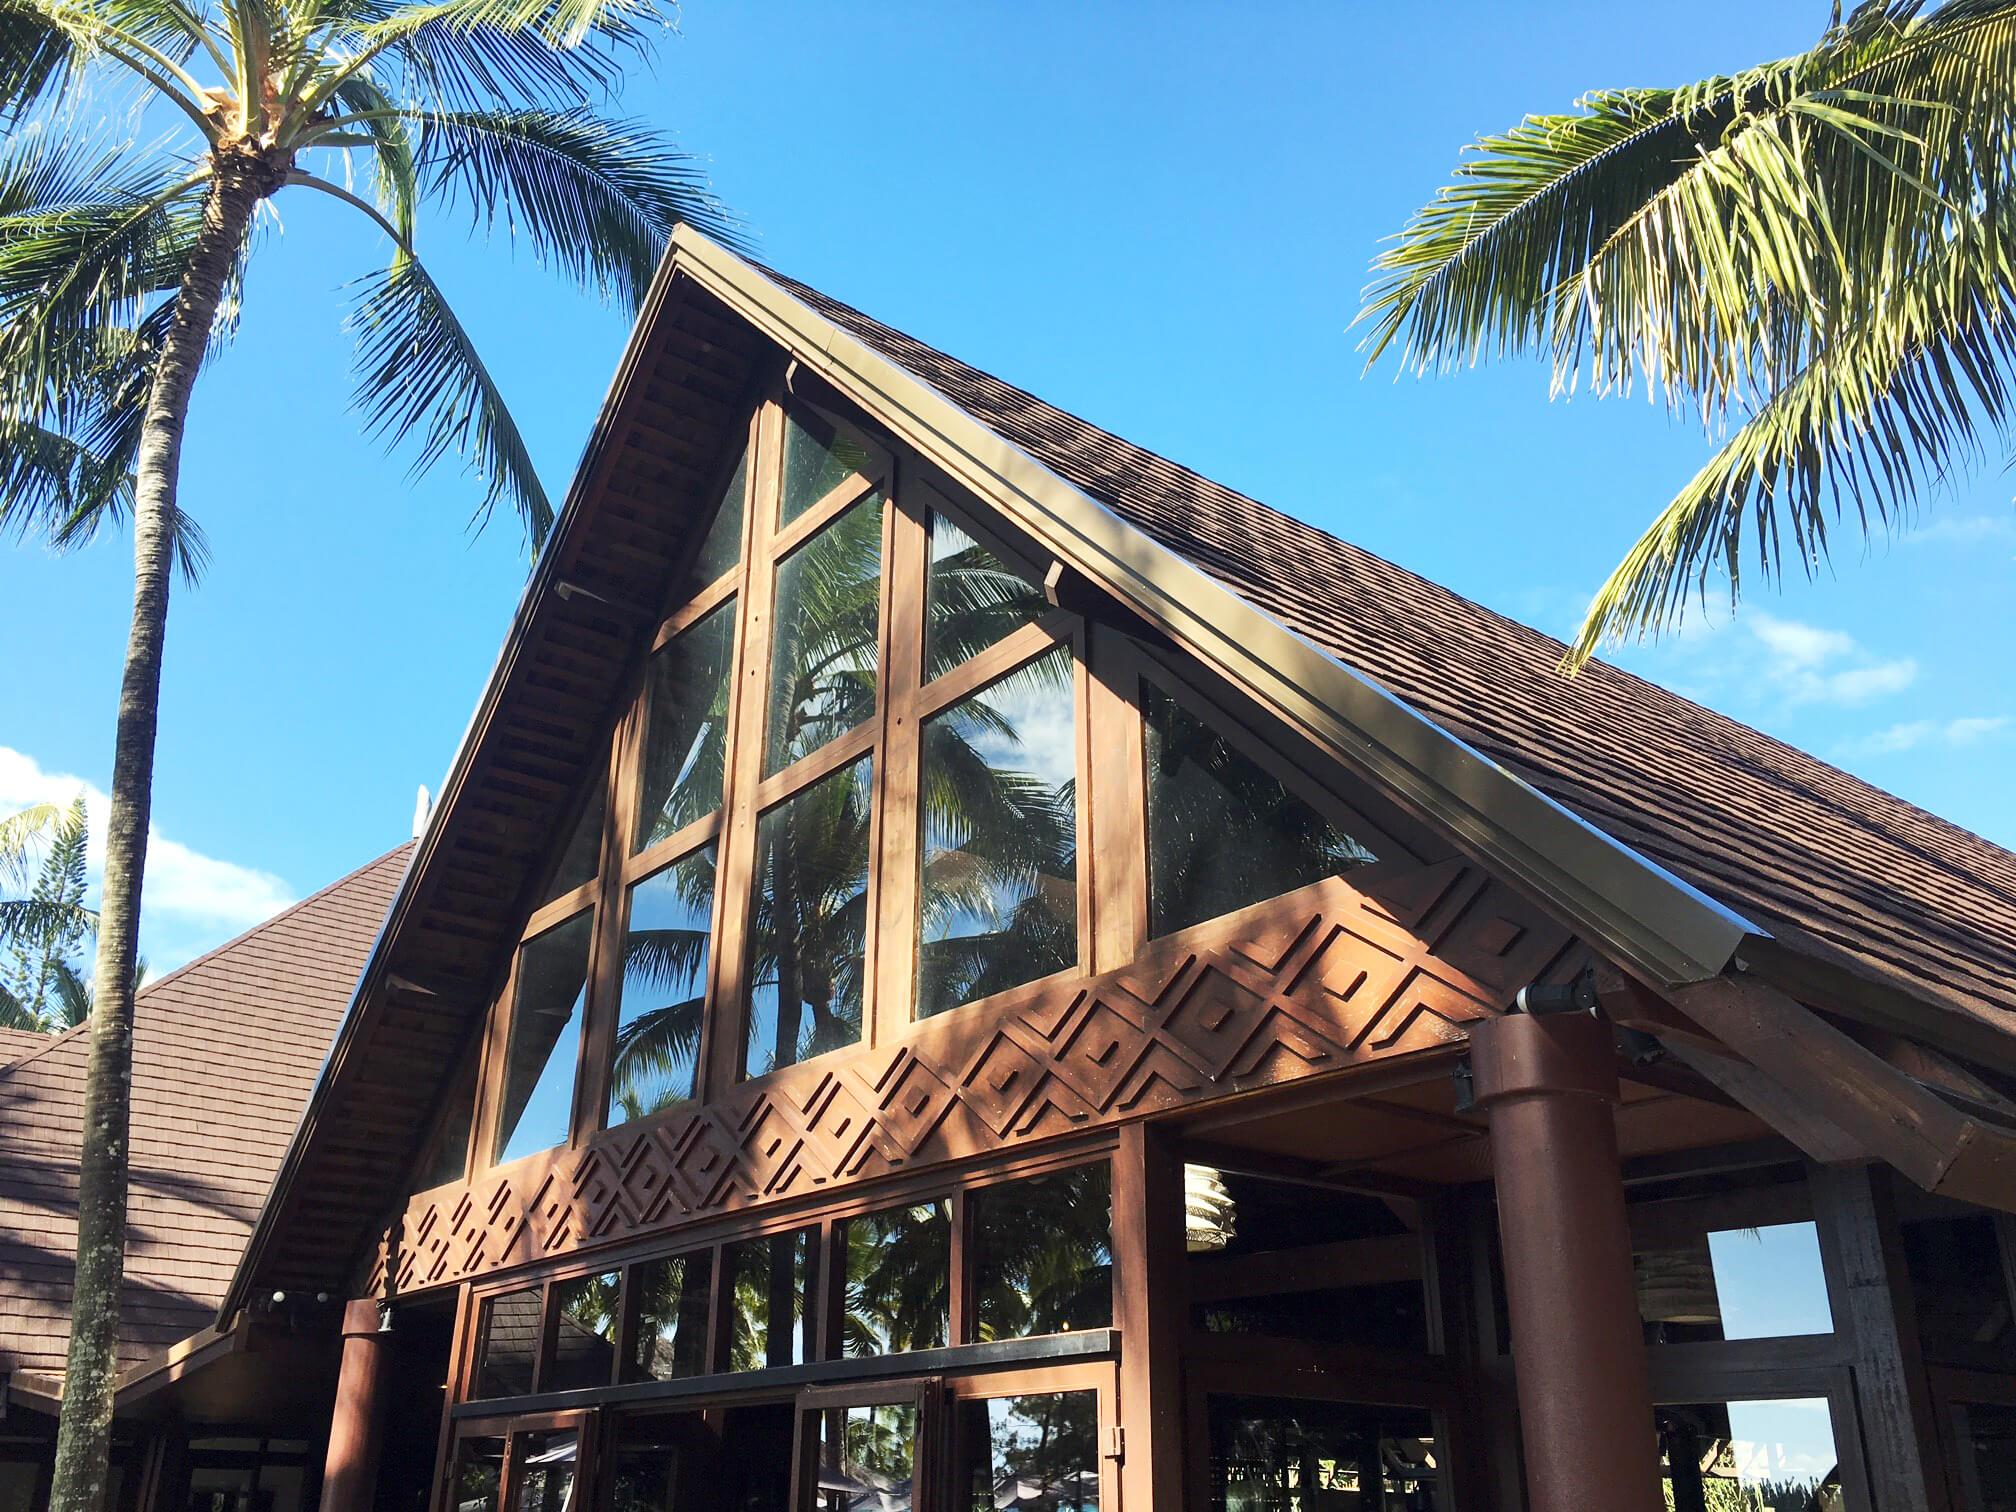 re-roofing-in-paradise-2.jpg